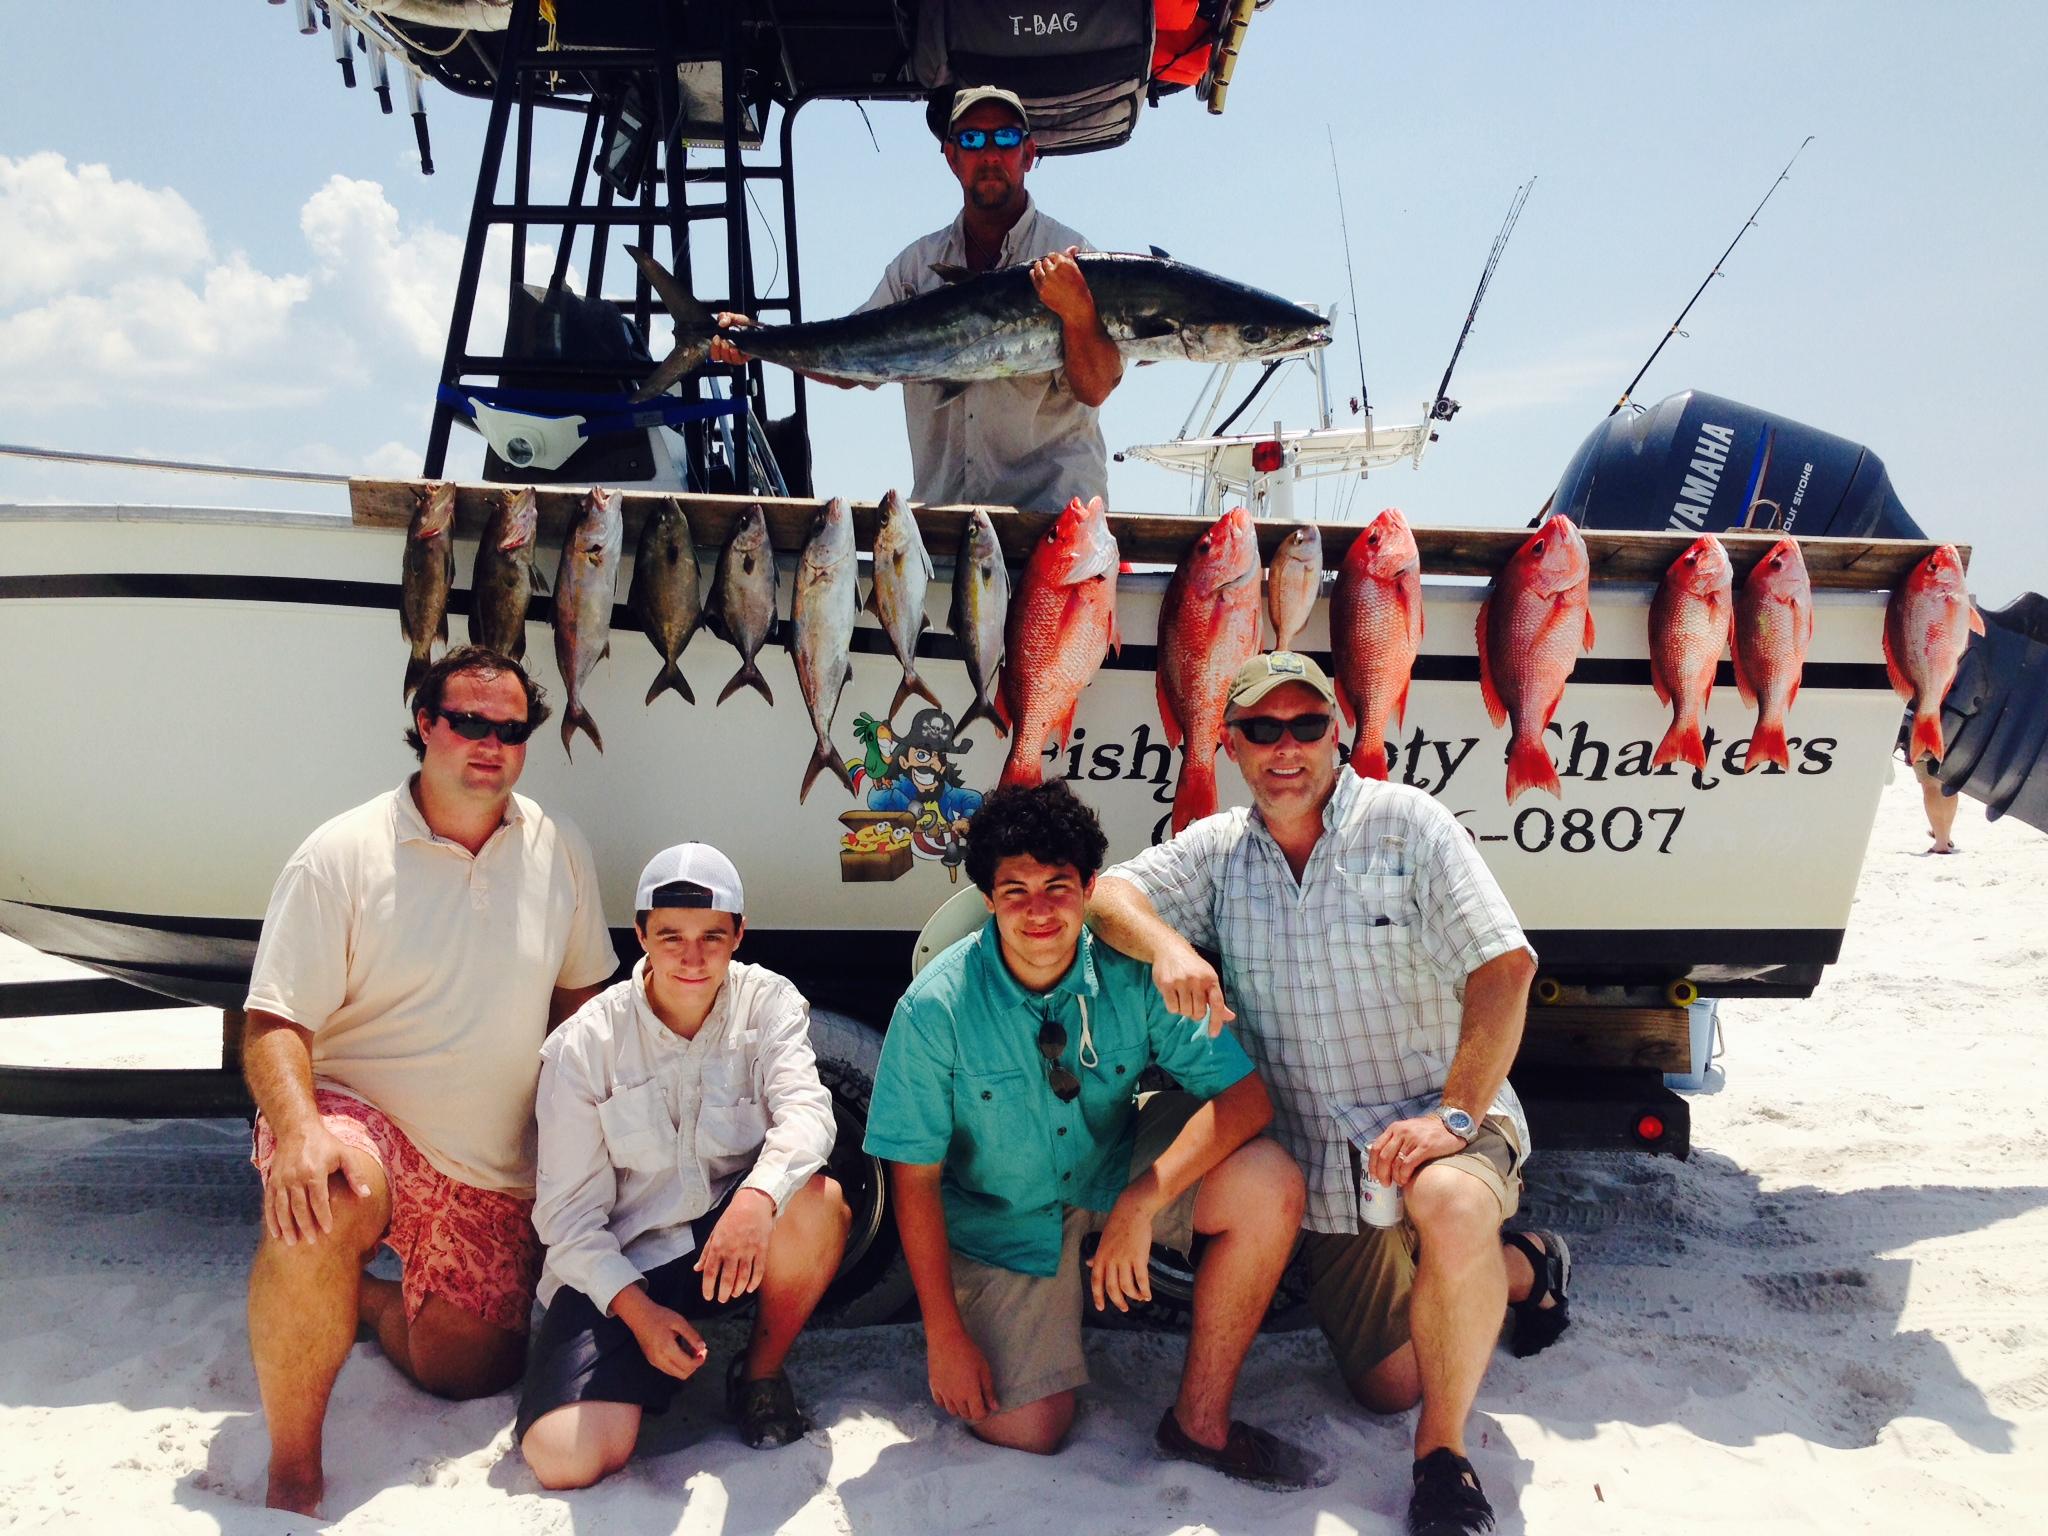 Fishy Booty Caharters - Grayton Beach Floria 30A SoWal May 25, 11 45 40 AM.jpg